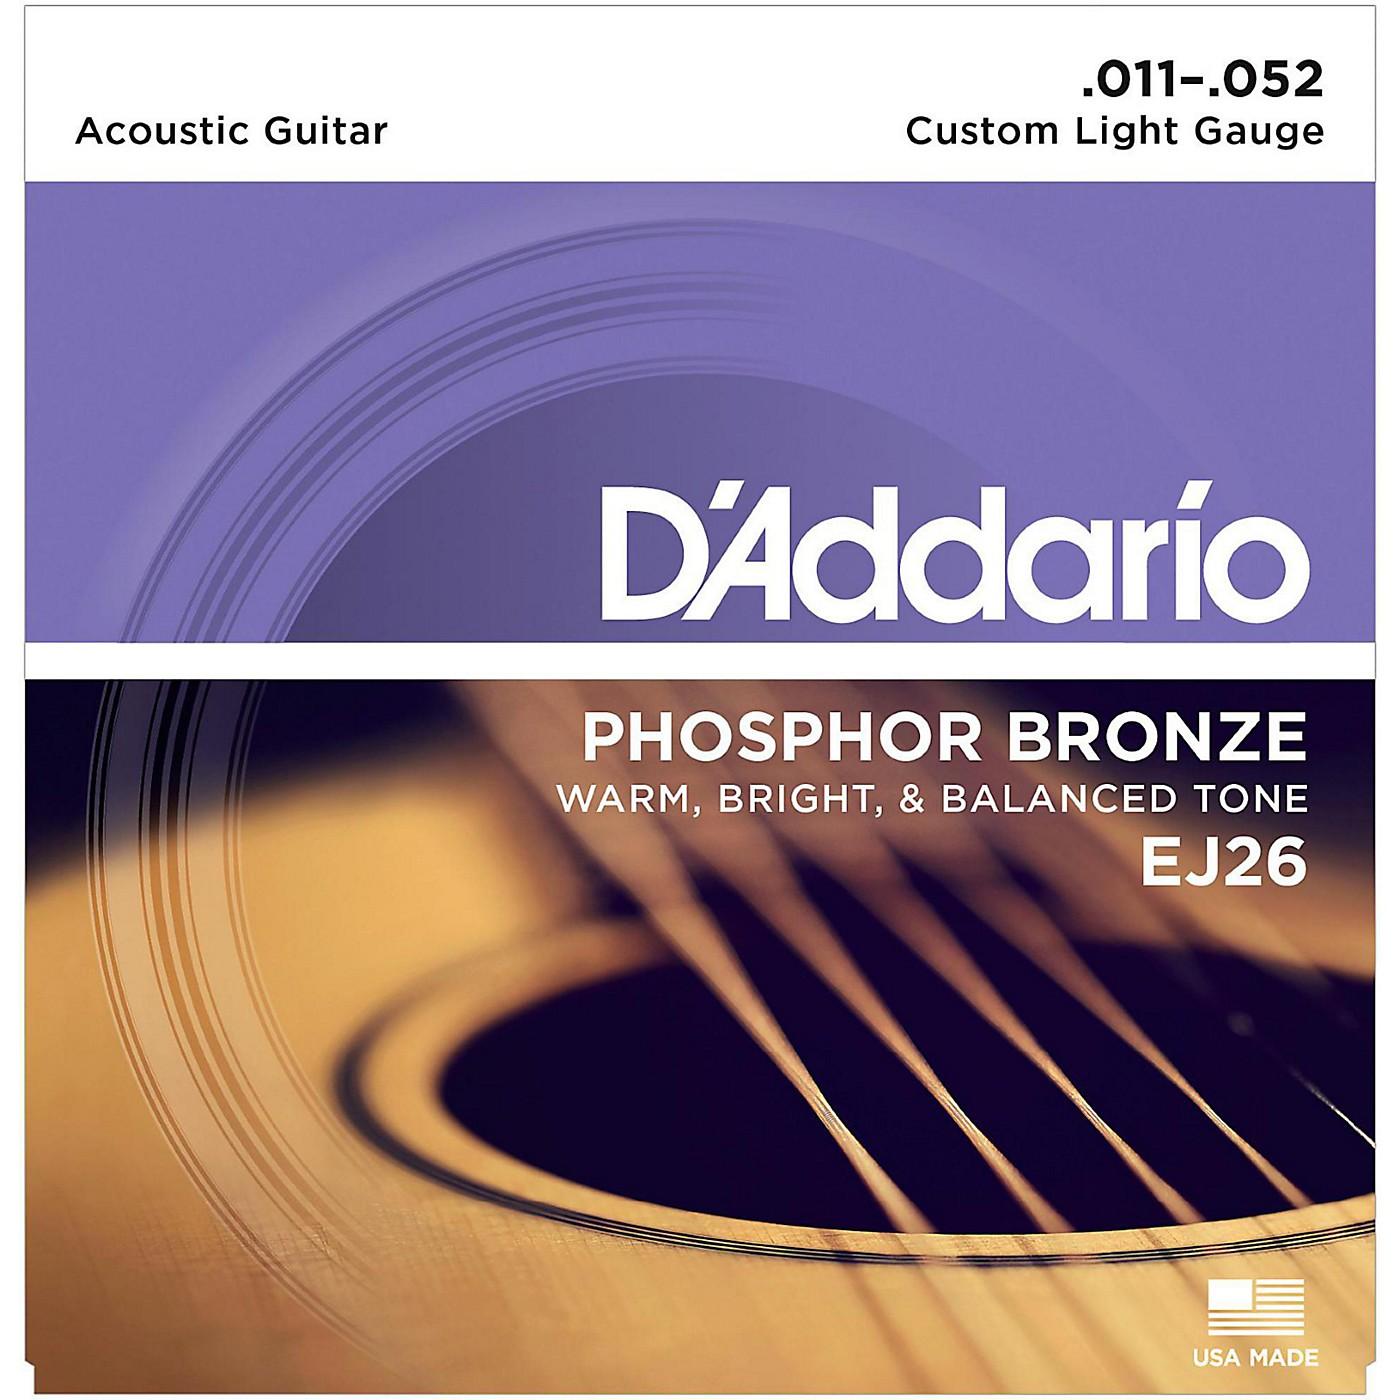 D'Addario EJ26 Phosphor Bronze Custom Light Acoustic Guitar Strings thumbnail